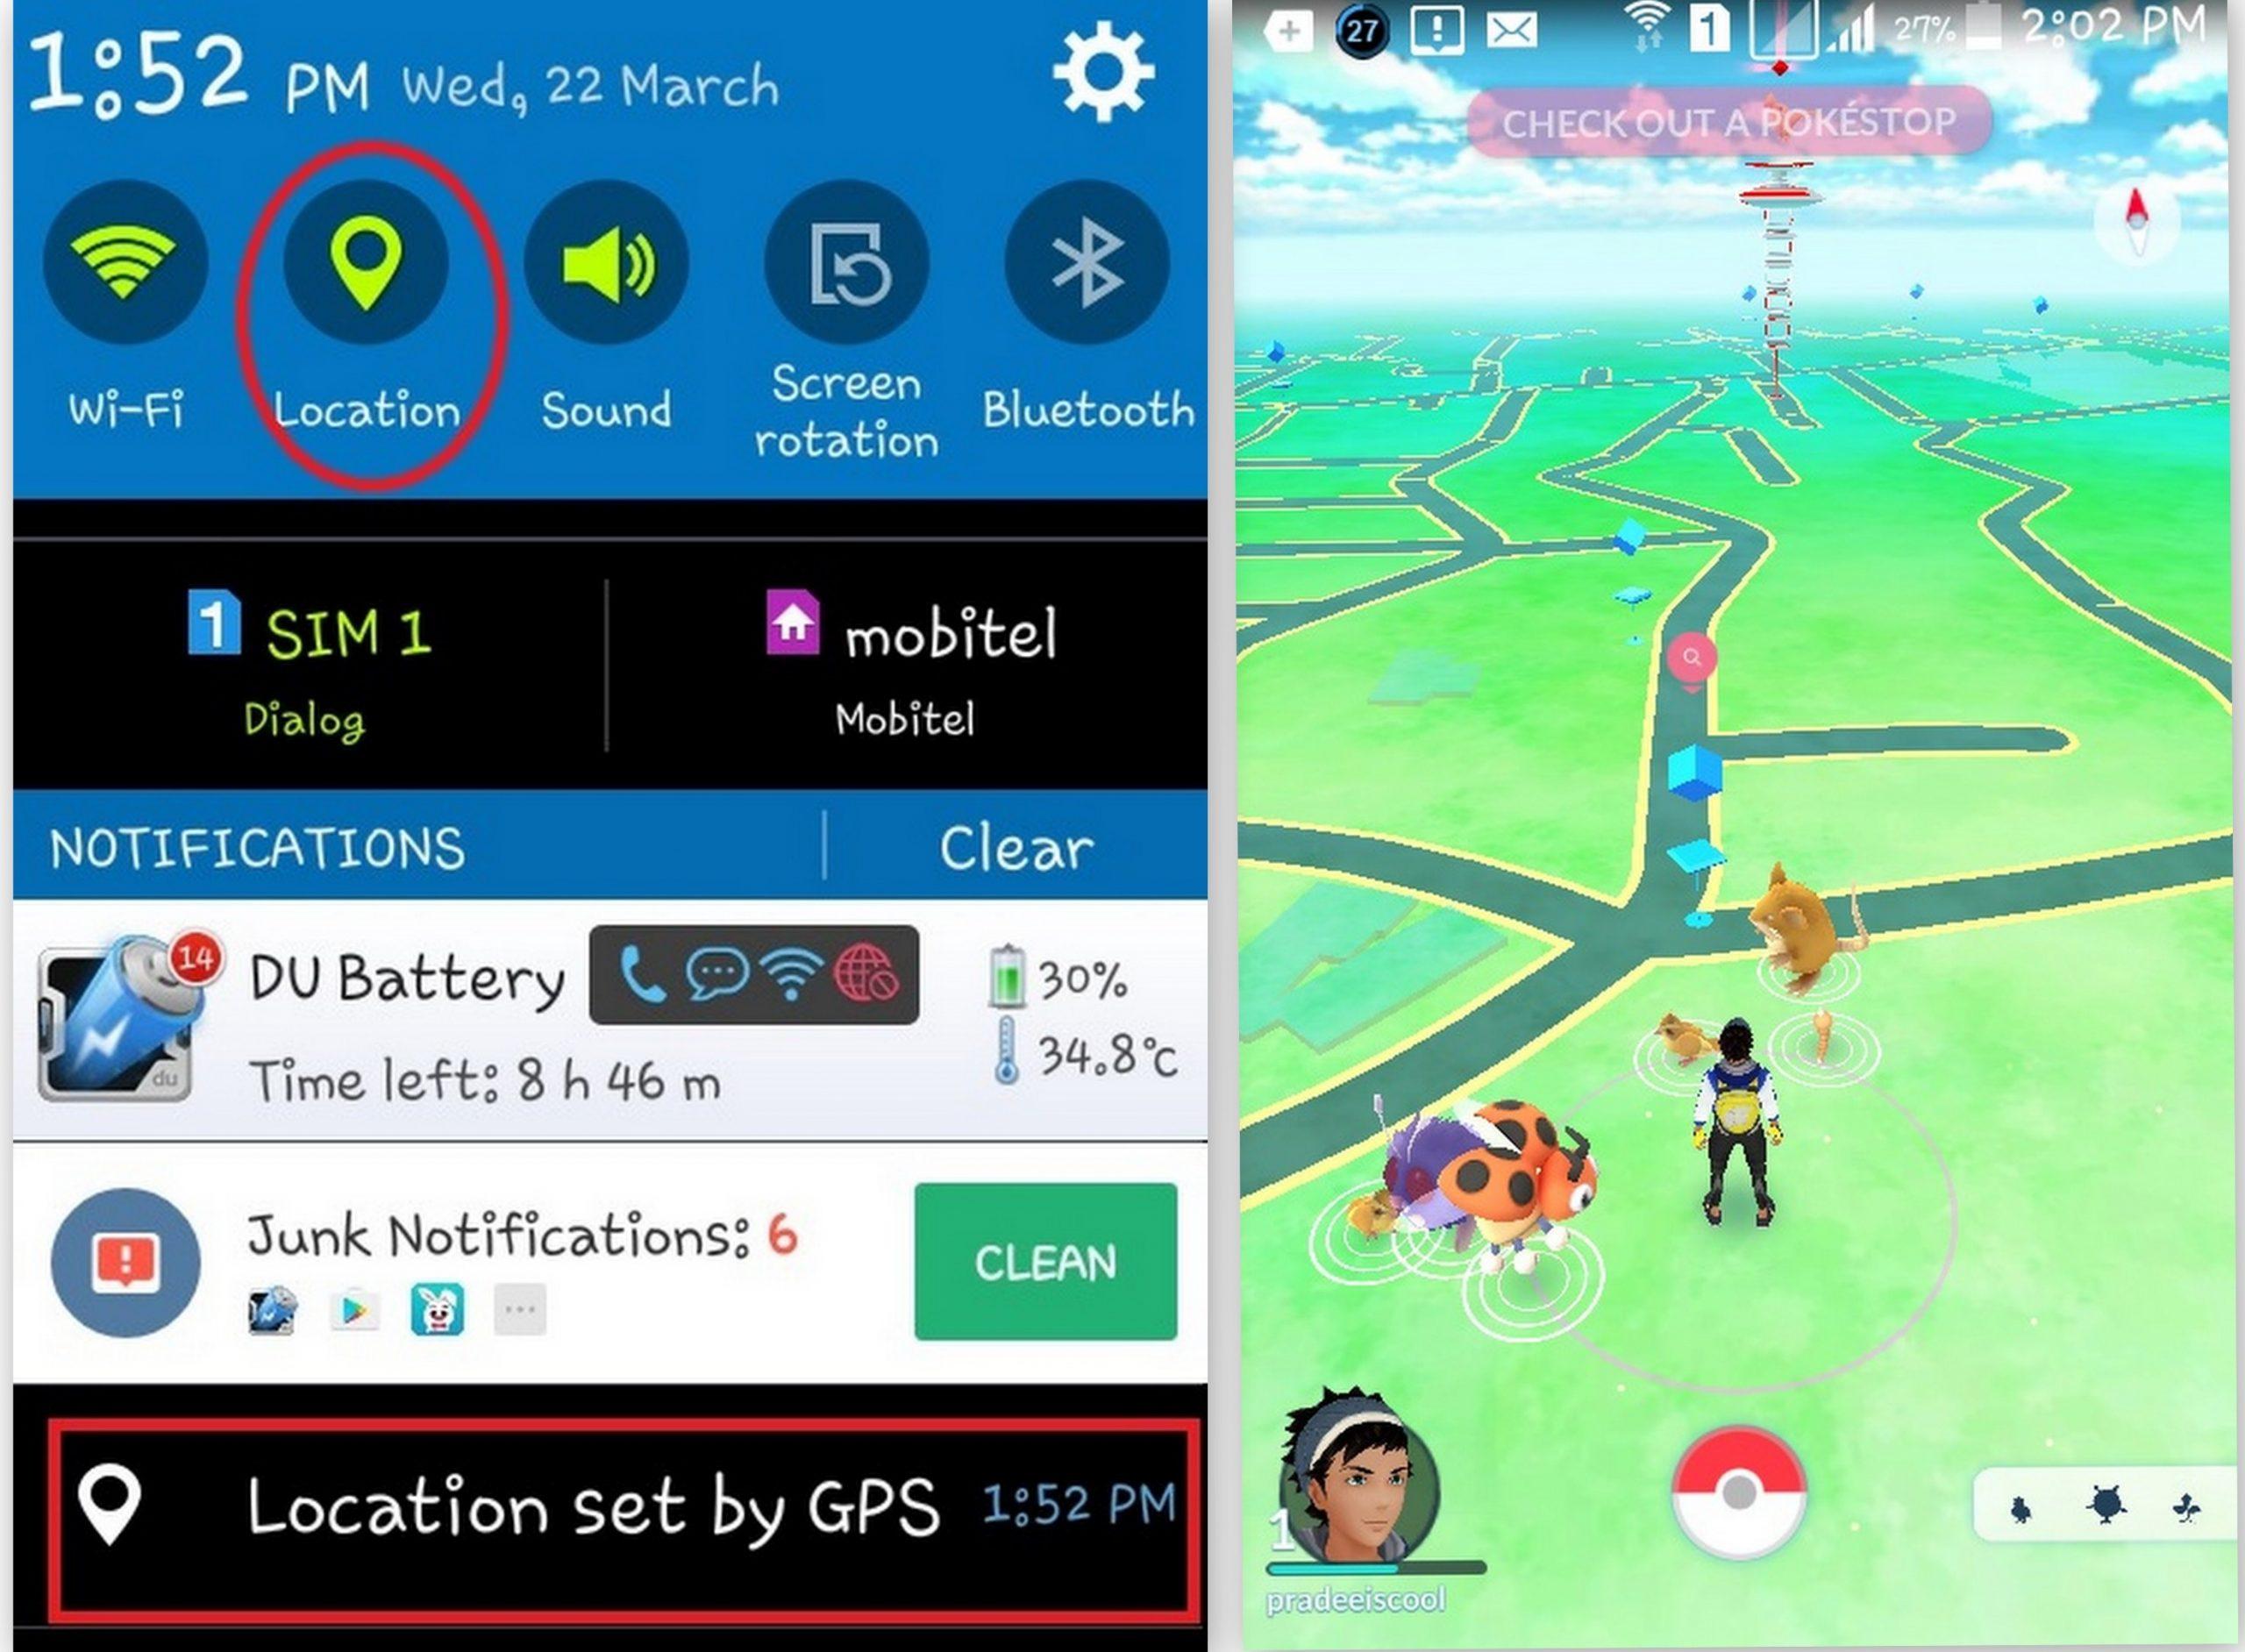 PokemonGo GPRS Signal